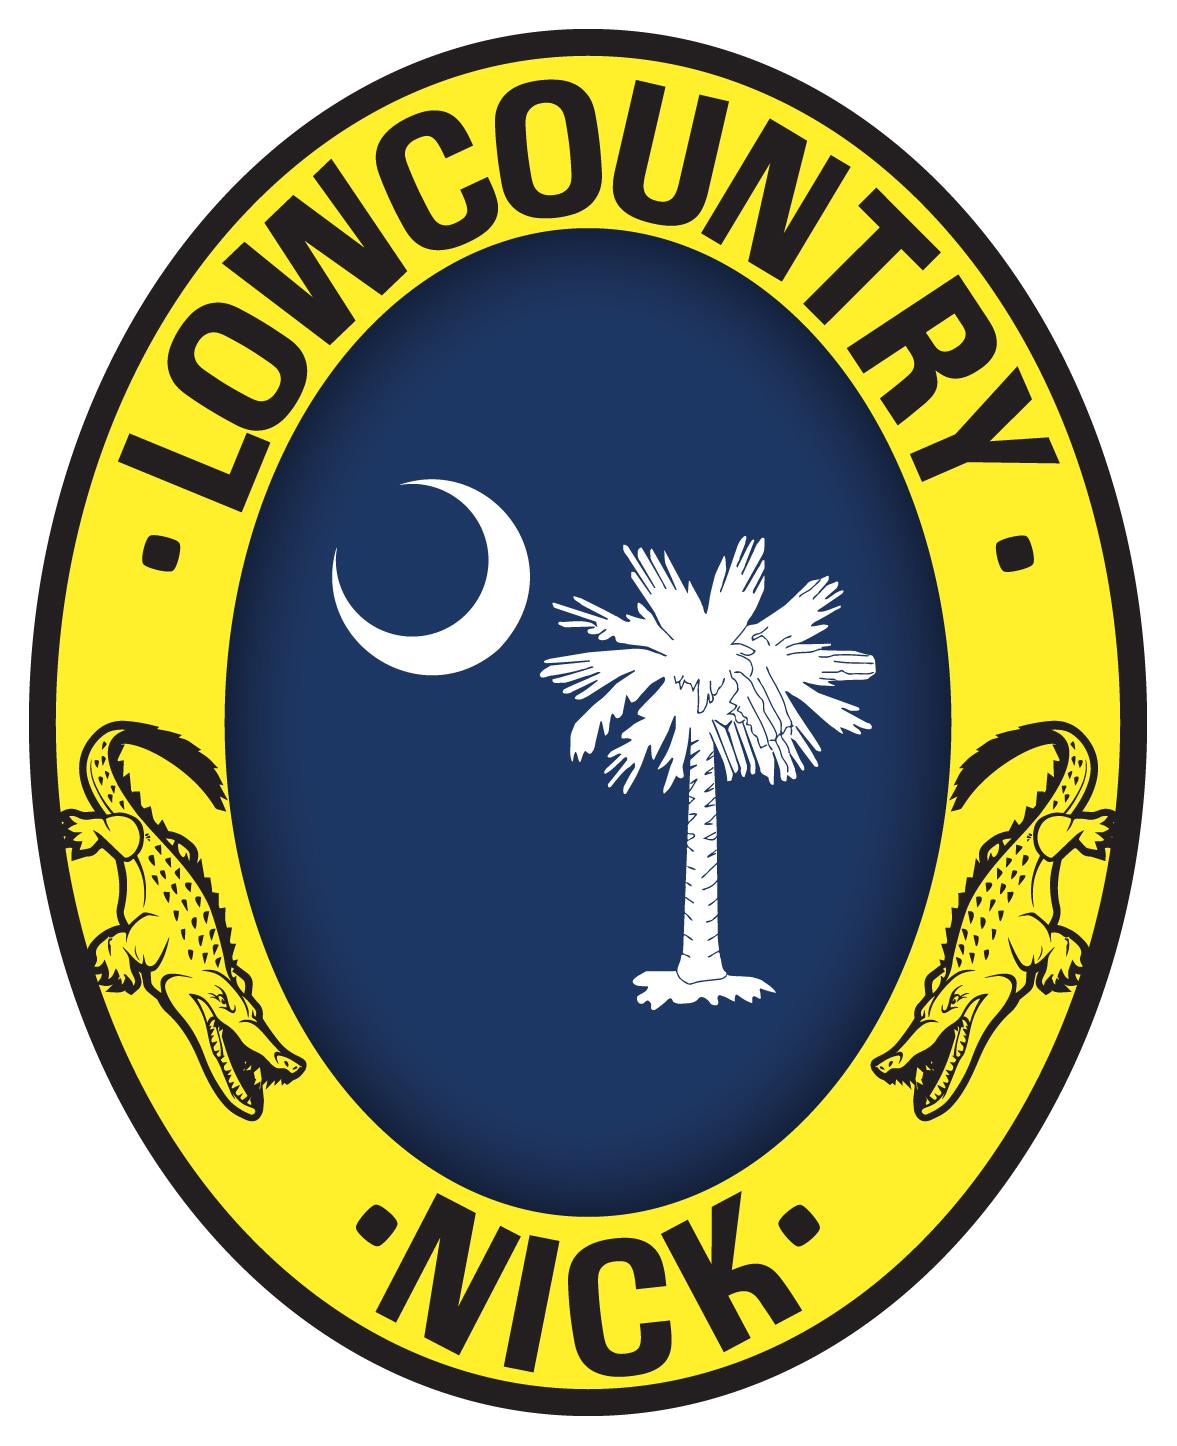 Lowcountry Nick